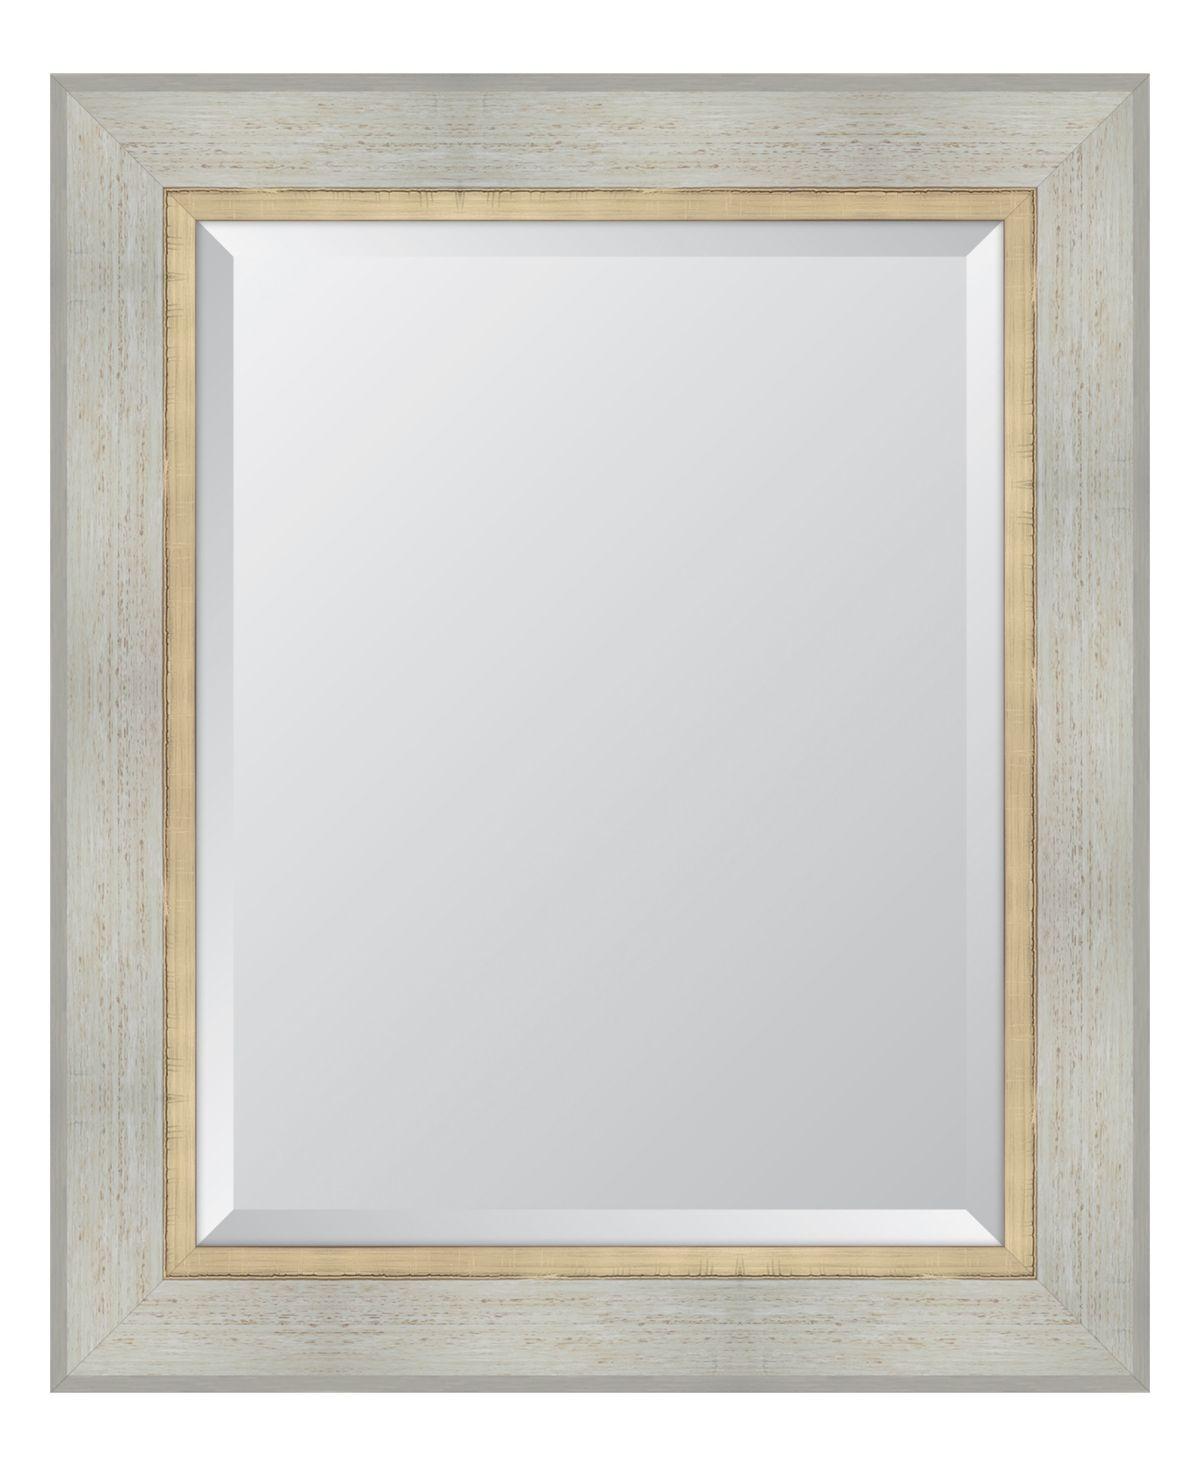 White Catalina Framed Mirror 30 X 36 X 2 Multi In 2020 Mirror Frames Mirror Frame